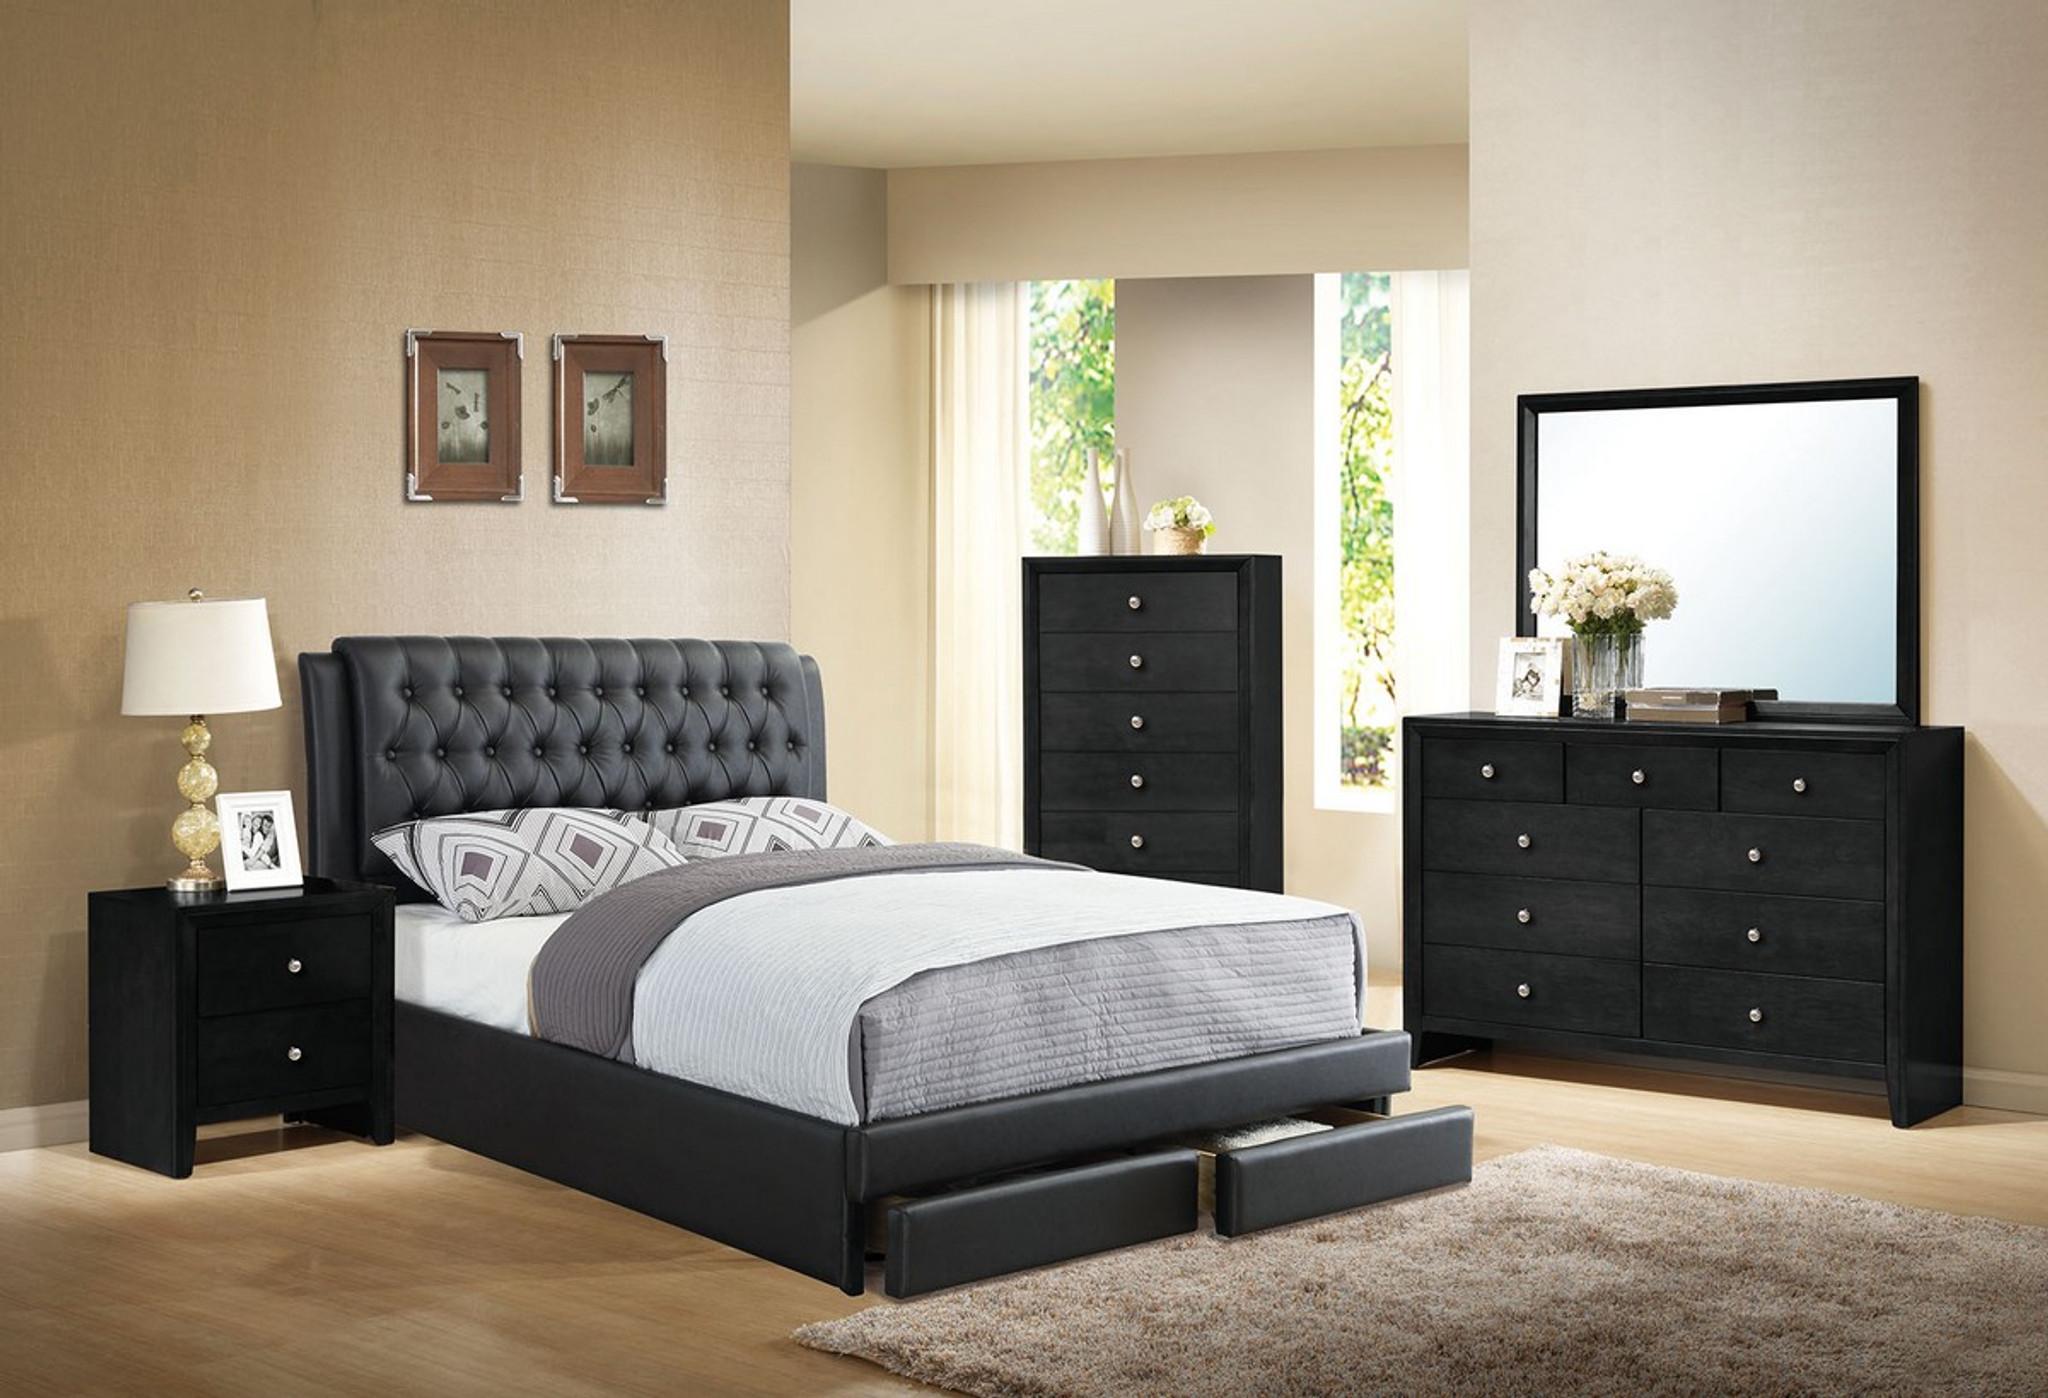 Image of: Kassa Mall Home Furniture F9338 Master Bedroom Bed Frame Platform With Front Storage Drawers Upholstered In Black Leather